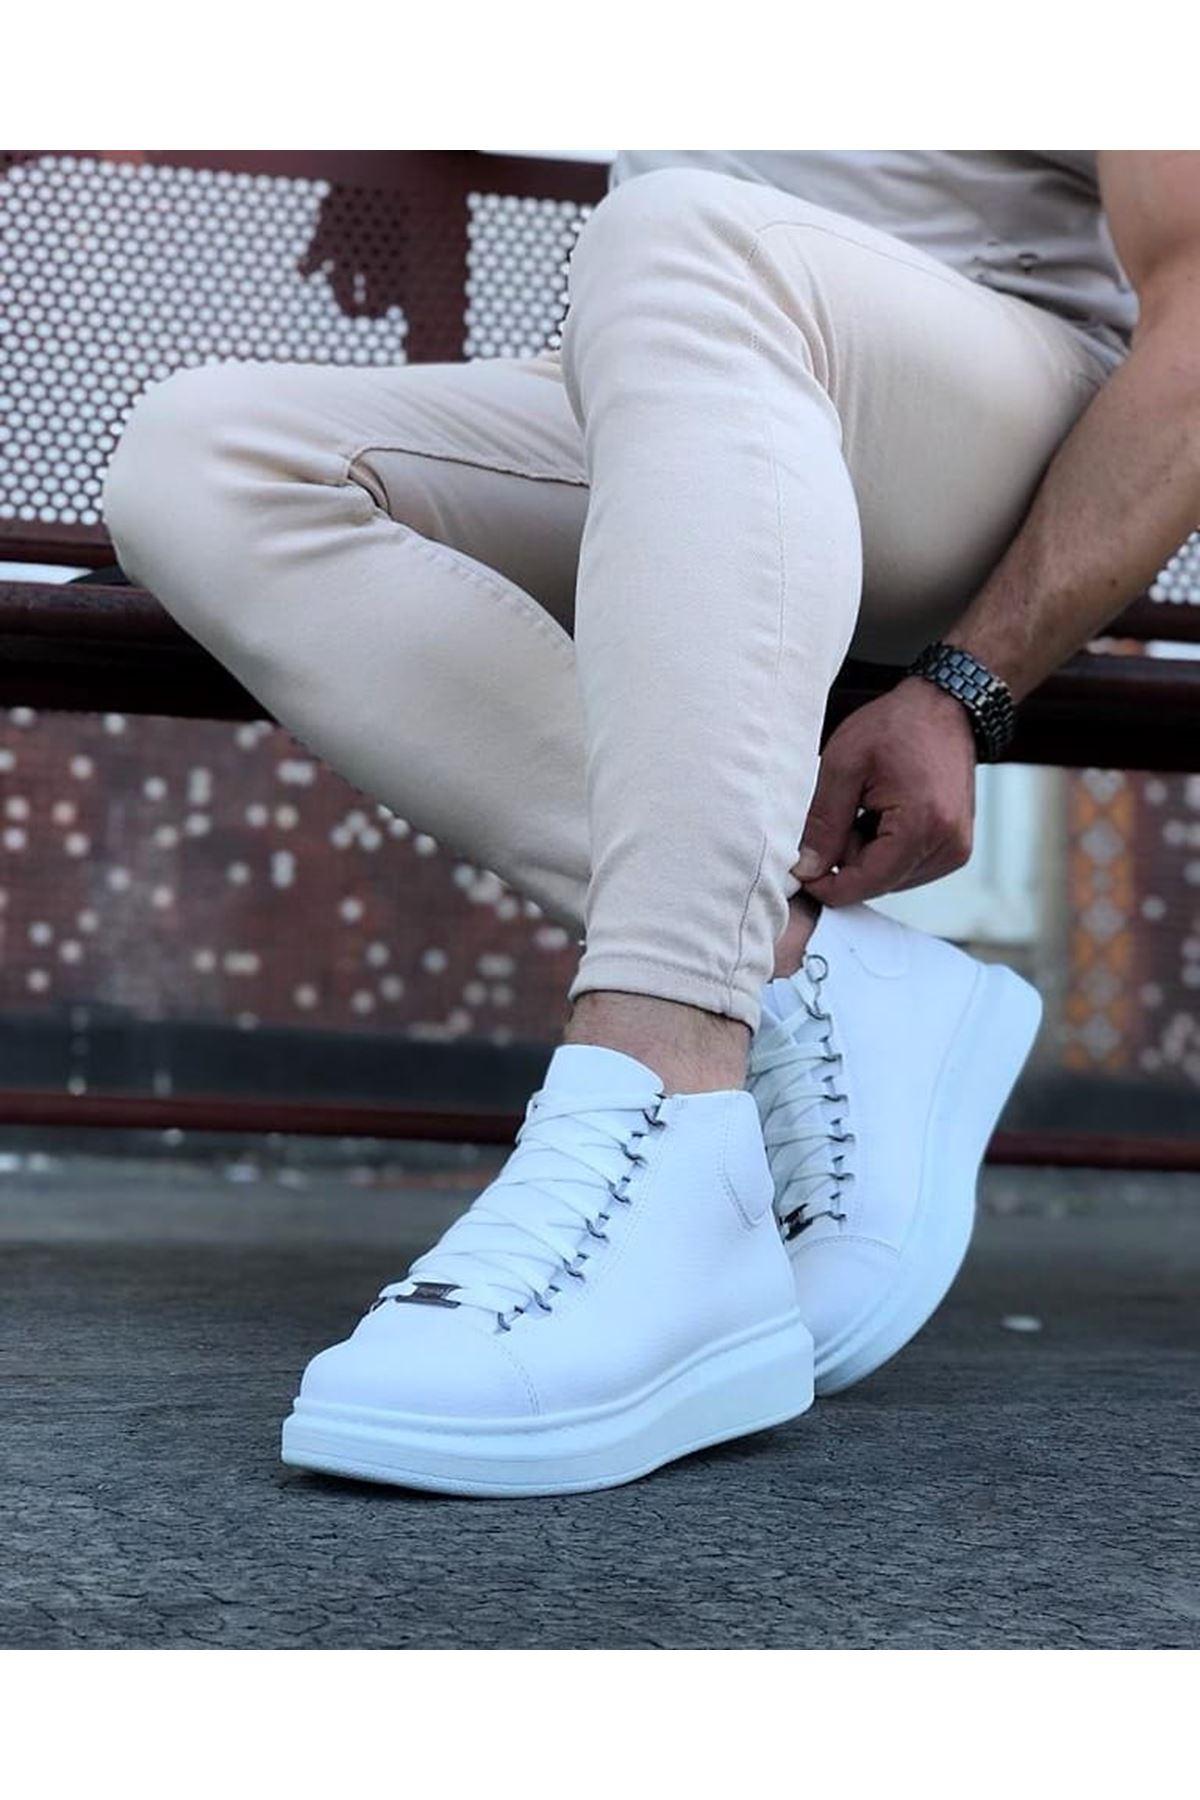 Wagoon WG032 Beyaz Bağcıklı Sneakers  Yarım Bilek Bot